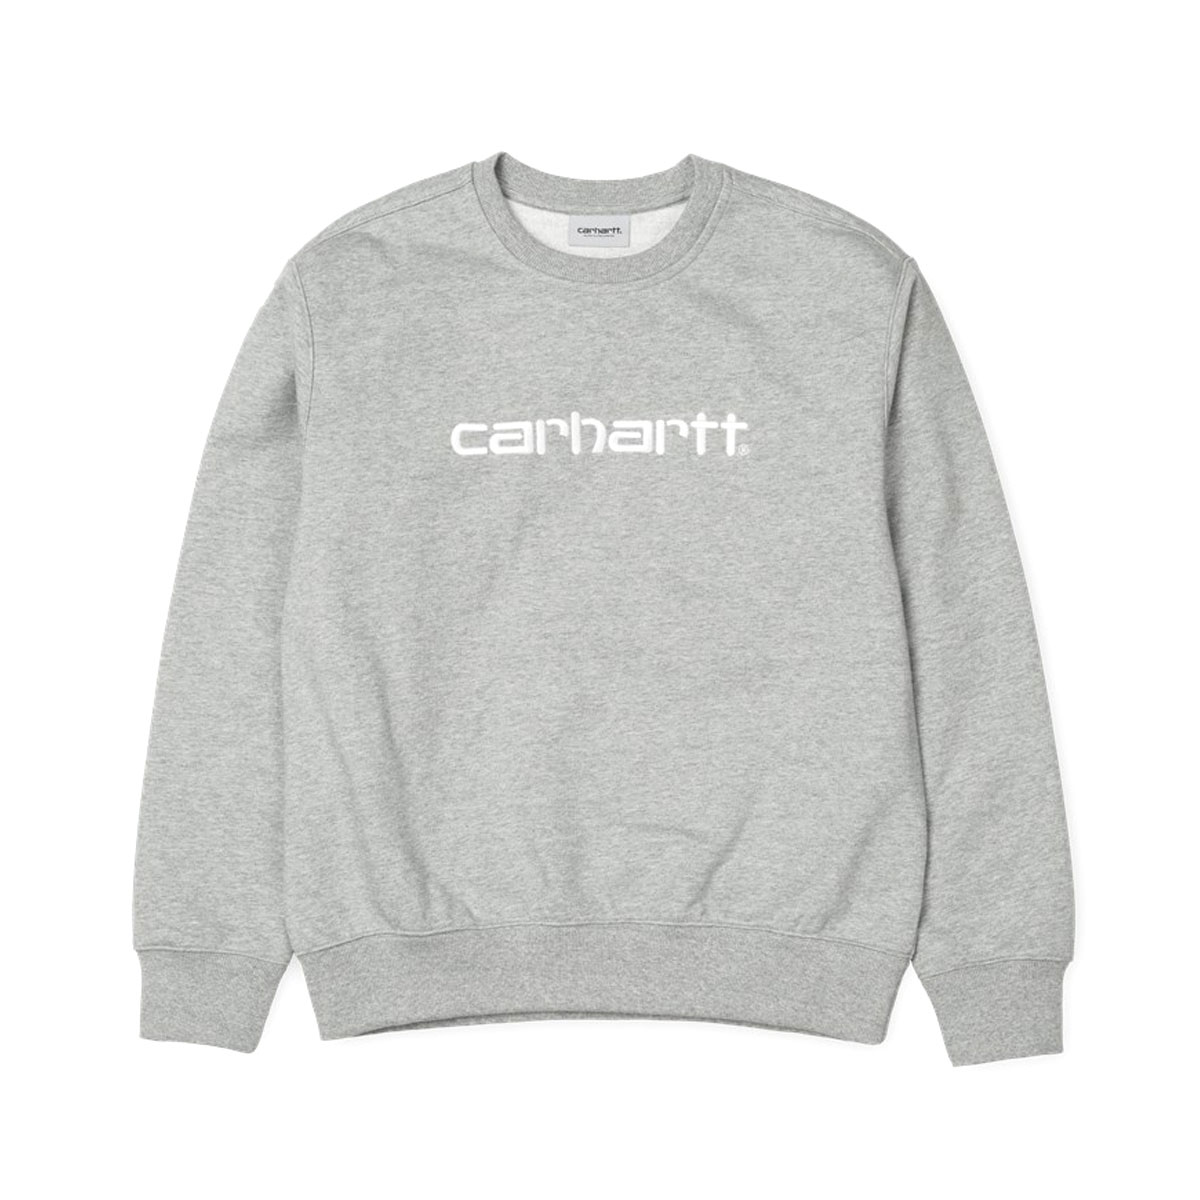 CARHARTT CARHARTT SWEATSHIRT(カーハート スウェットシャツ)Grey Heather/White【メンズ レディース スウェット】18FW-I